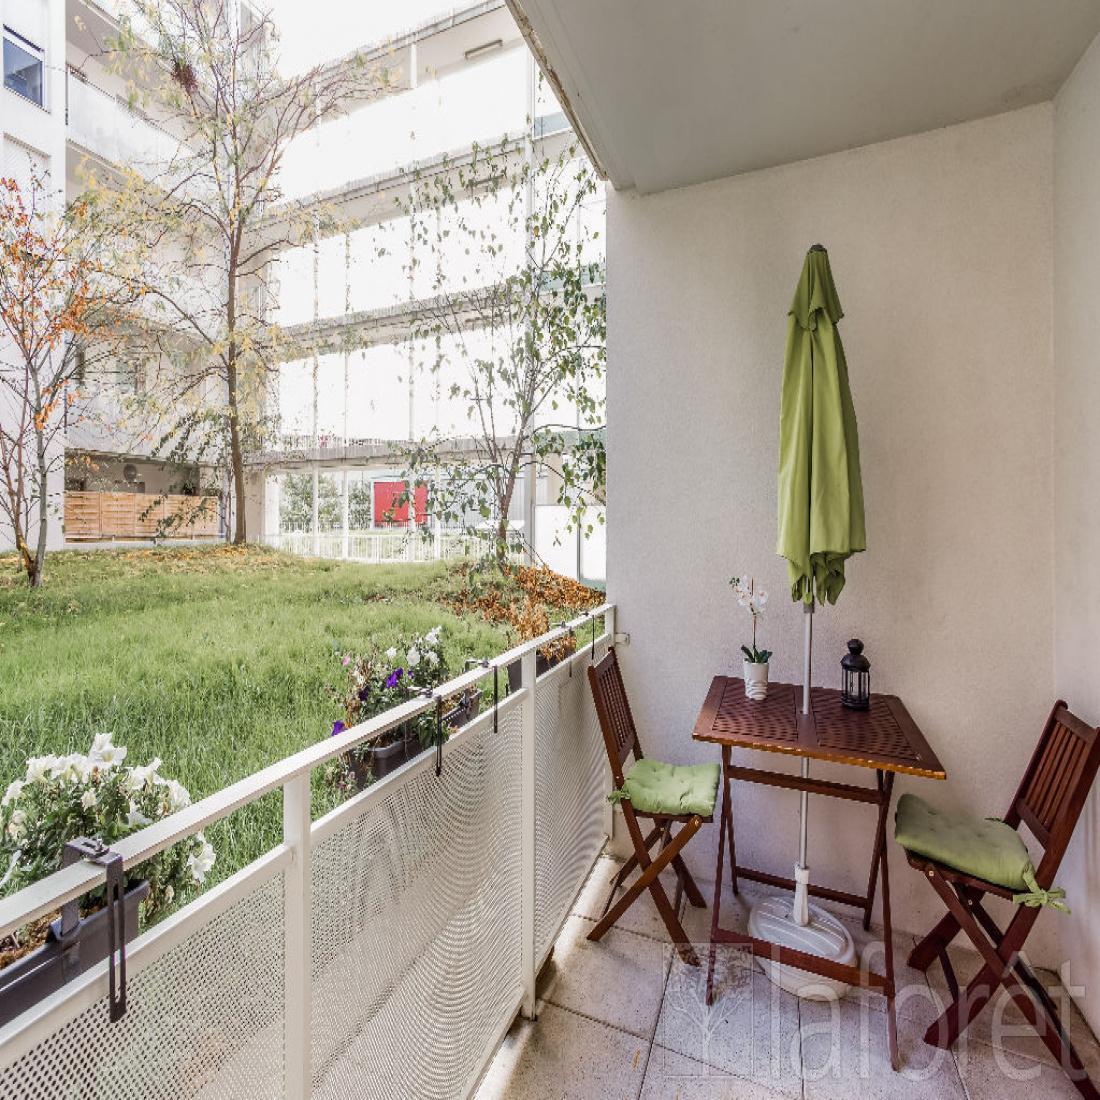 vente appartement lyon 3 pi ce s 61 70 m2 challeng. Black Bedroom Furniture Sets. Home Design Ideas